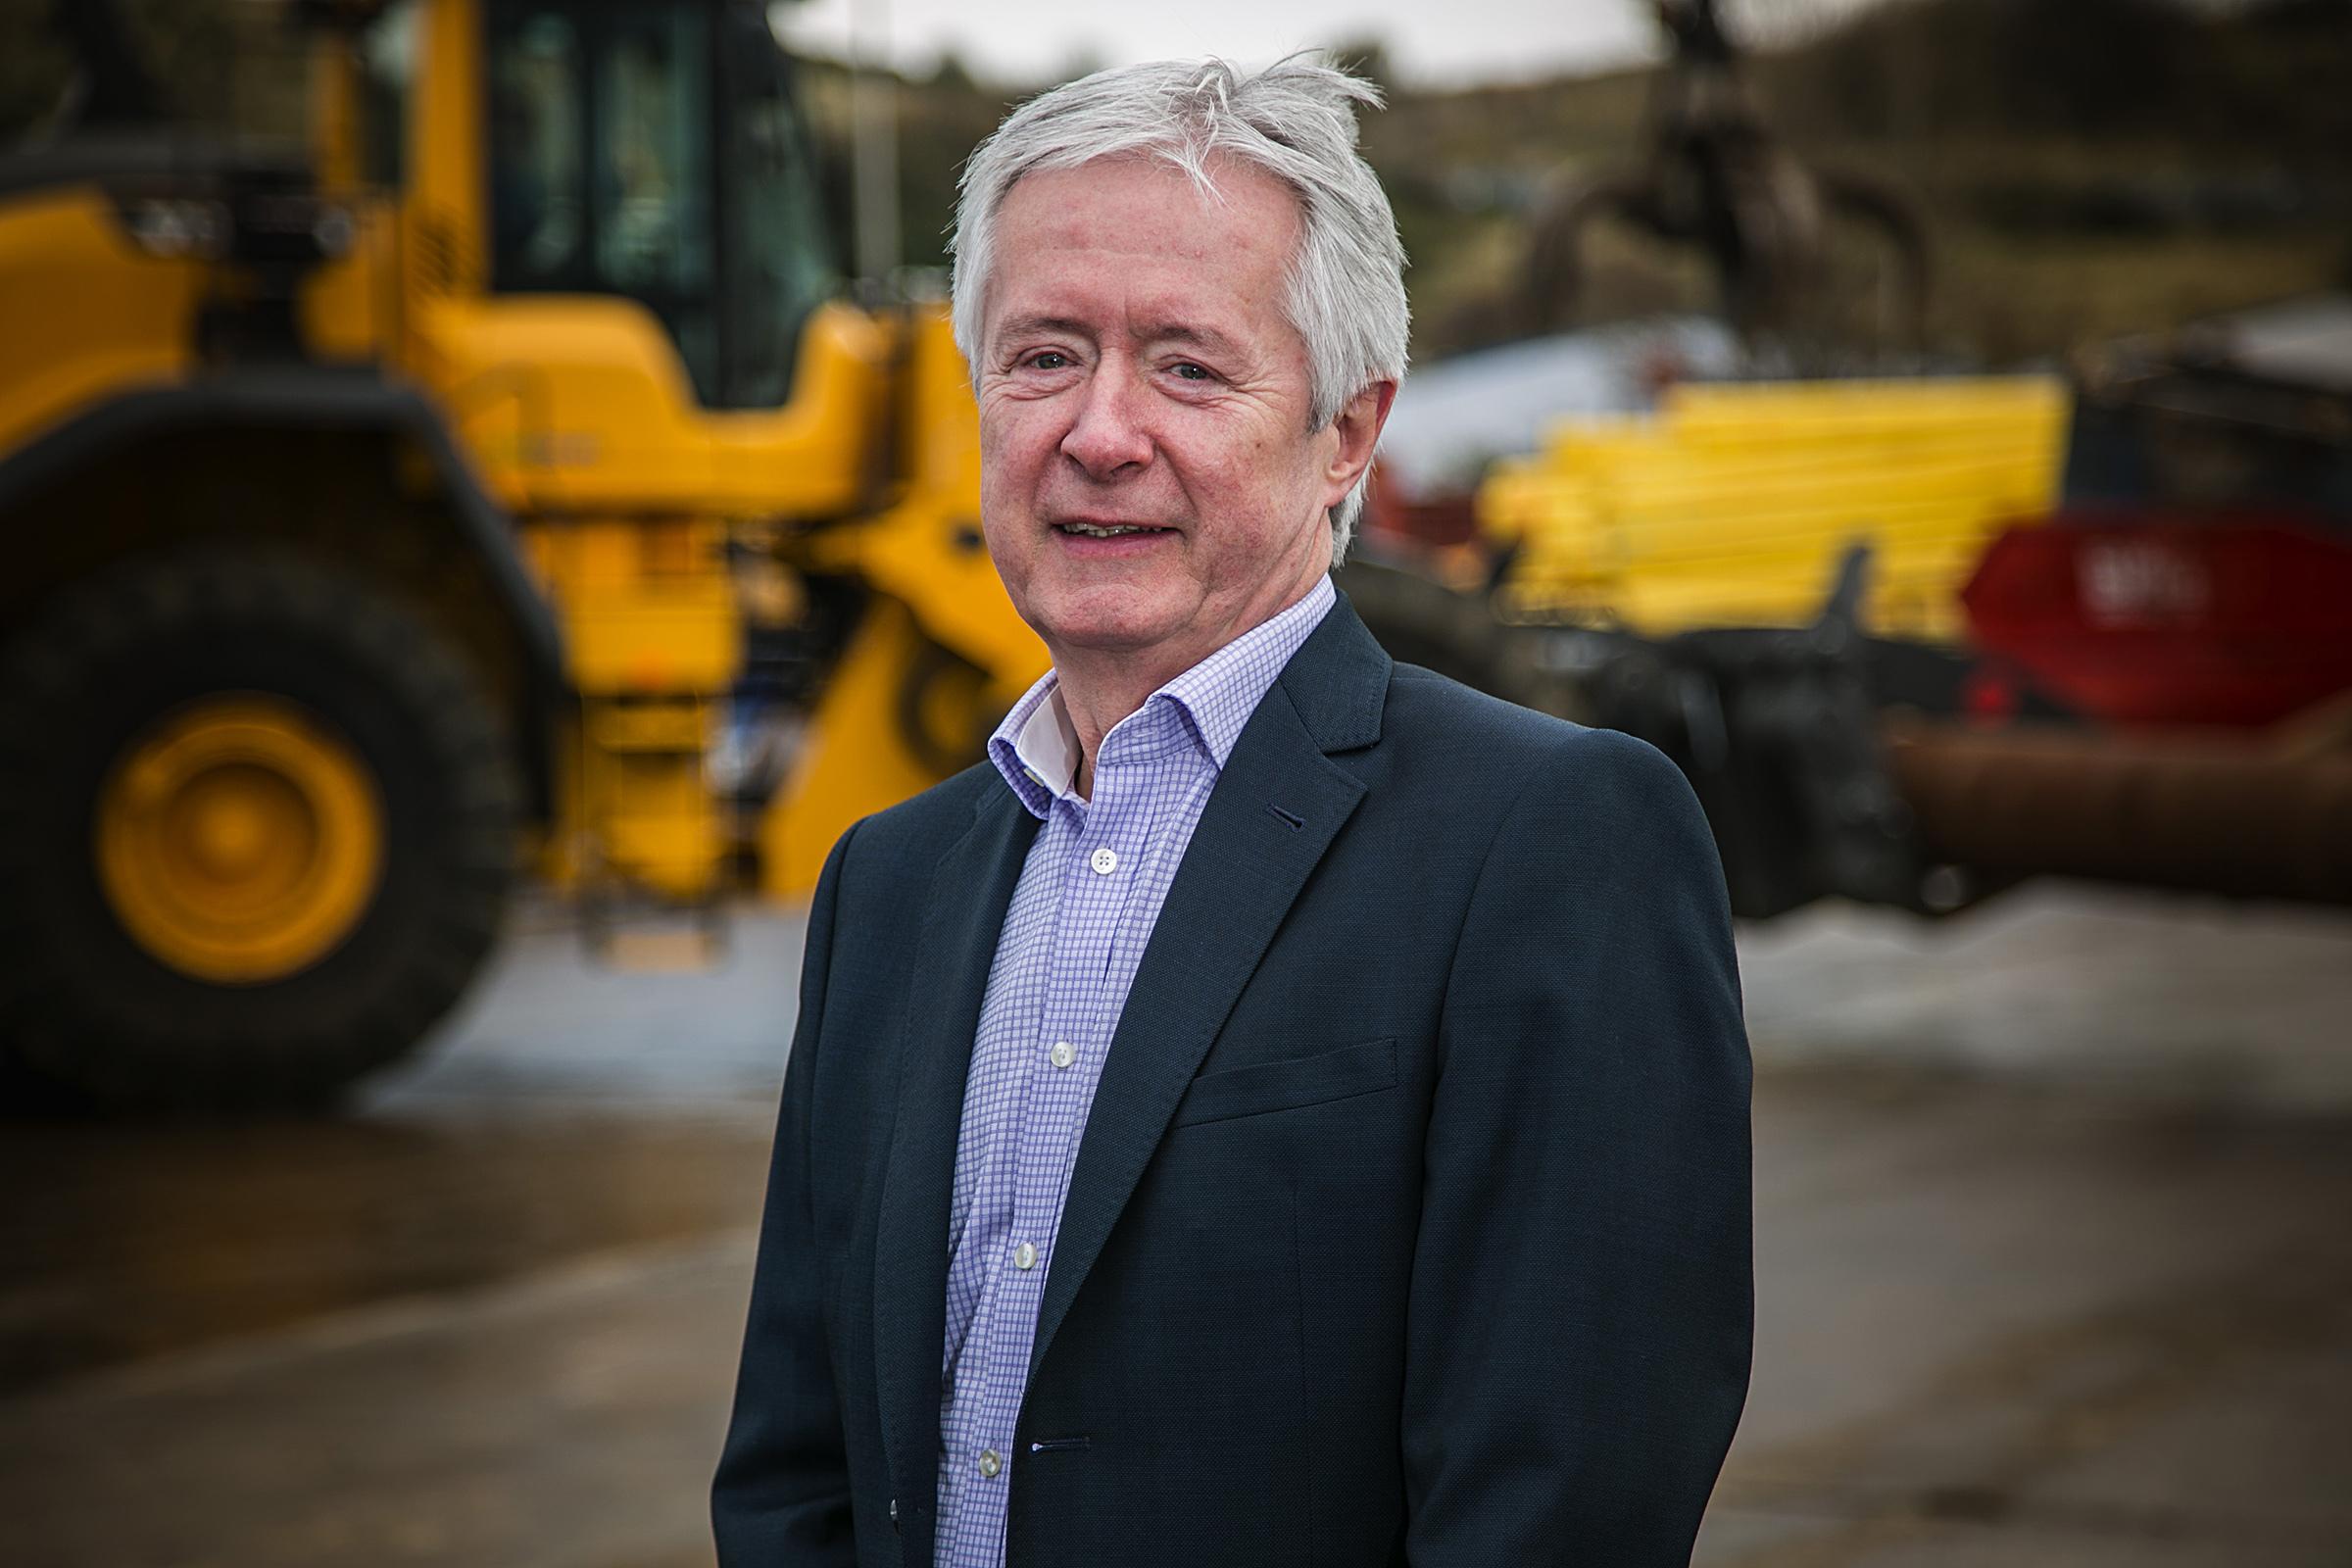 Ray Grant, environmental director at John Lawrie Group